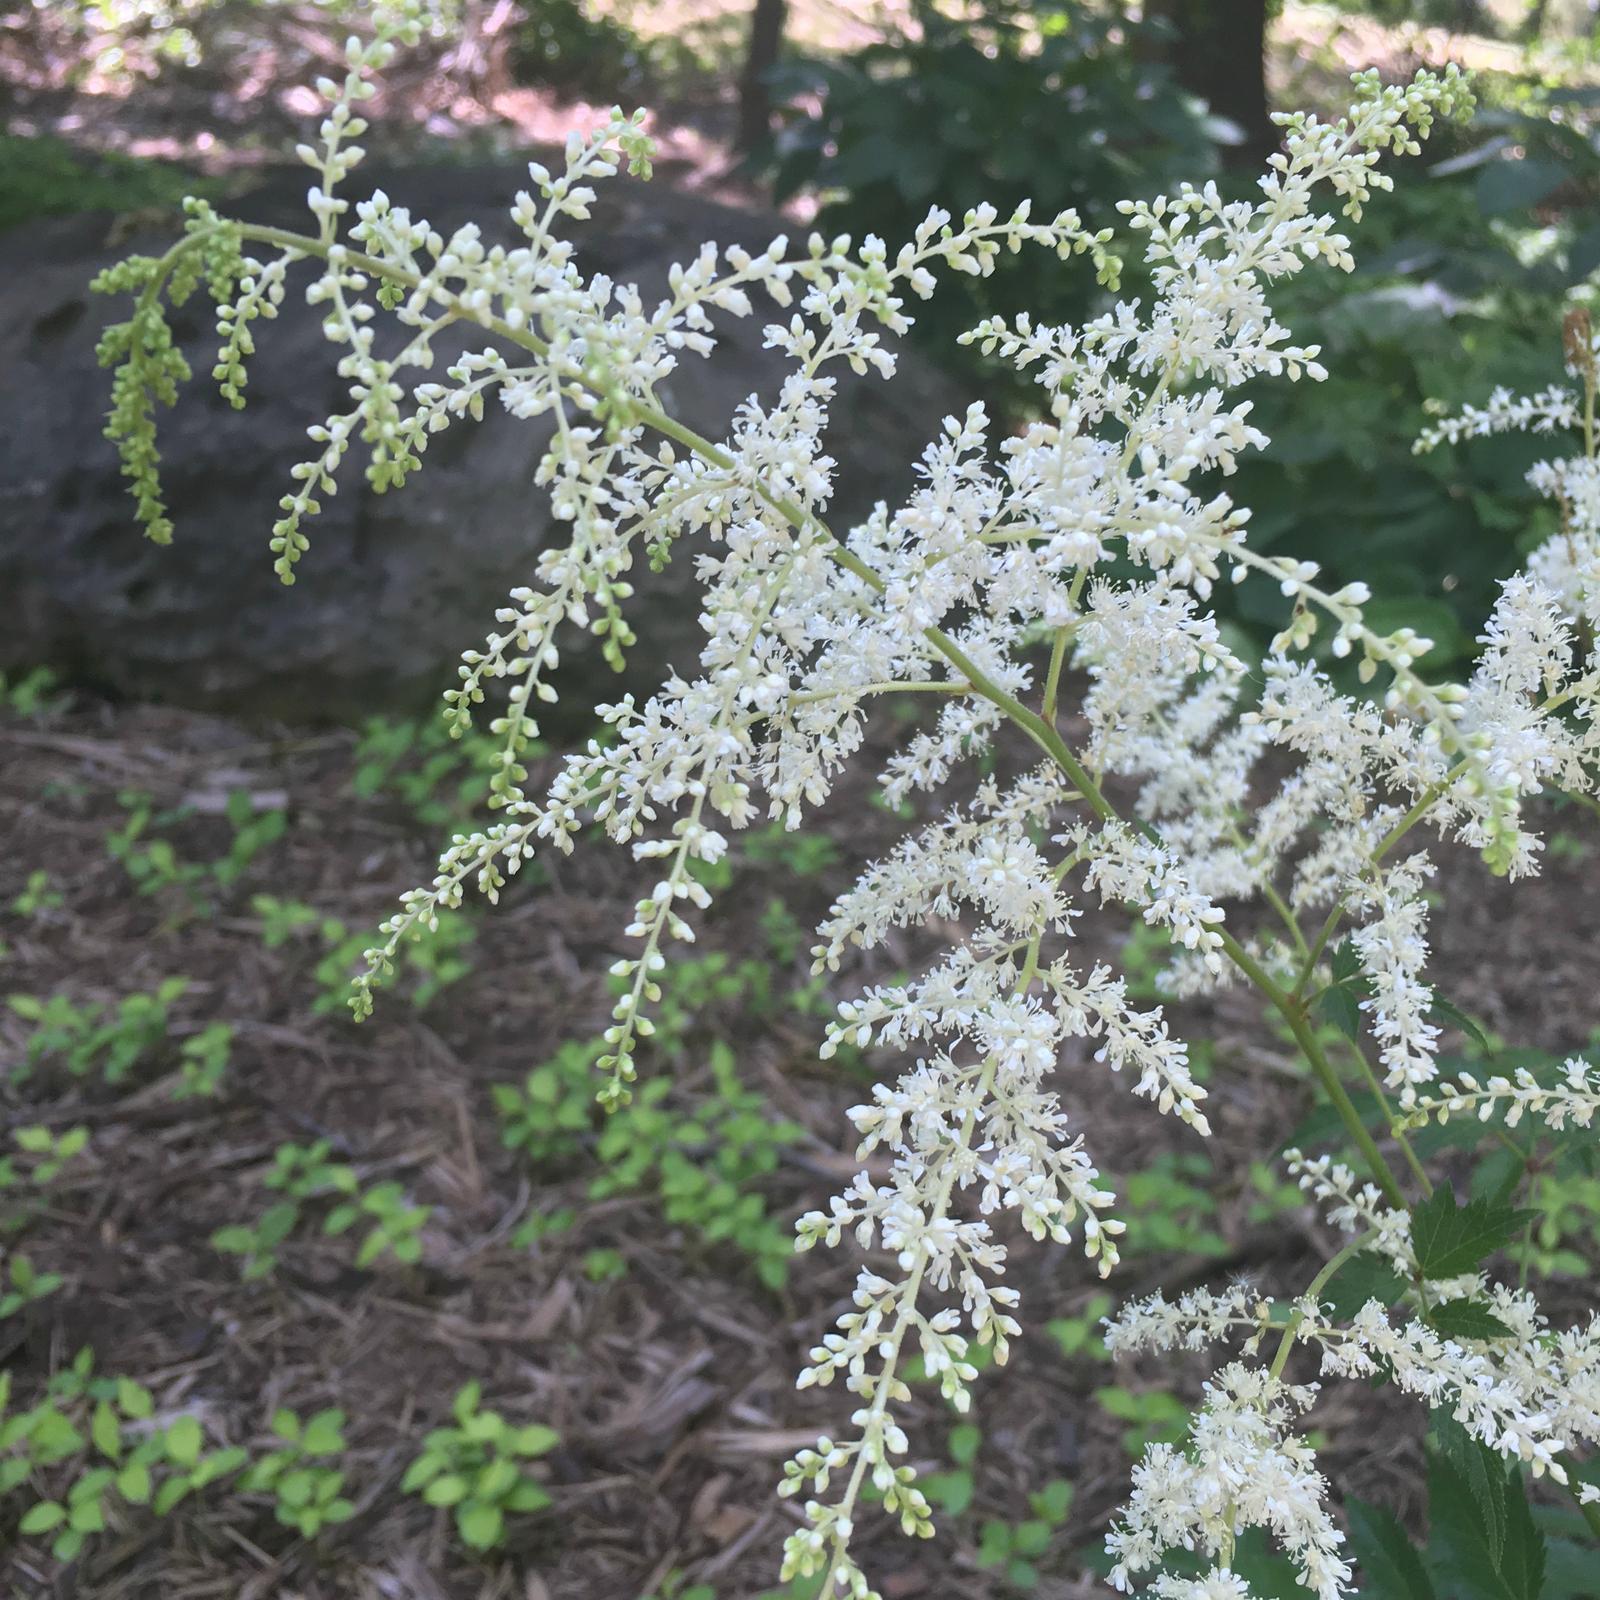 JS Weddings and Events, Grand Rapids Wedding Planner and Floral Designer - My Cutting Garden, My Flower Garden